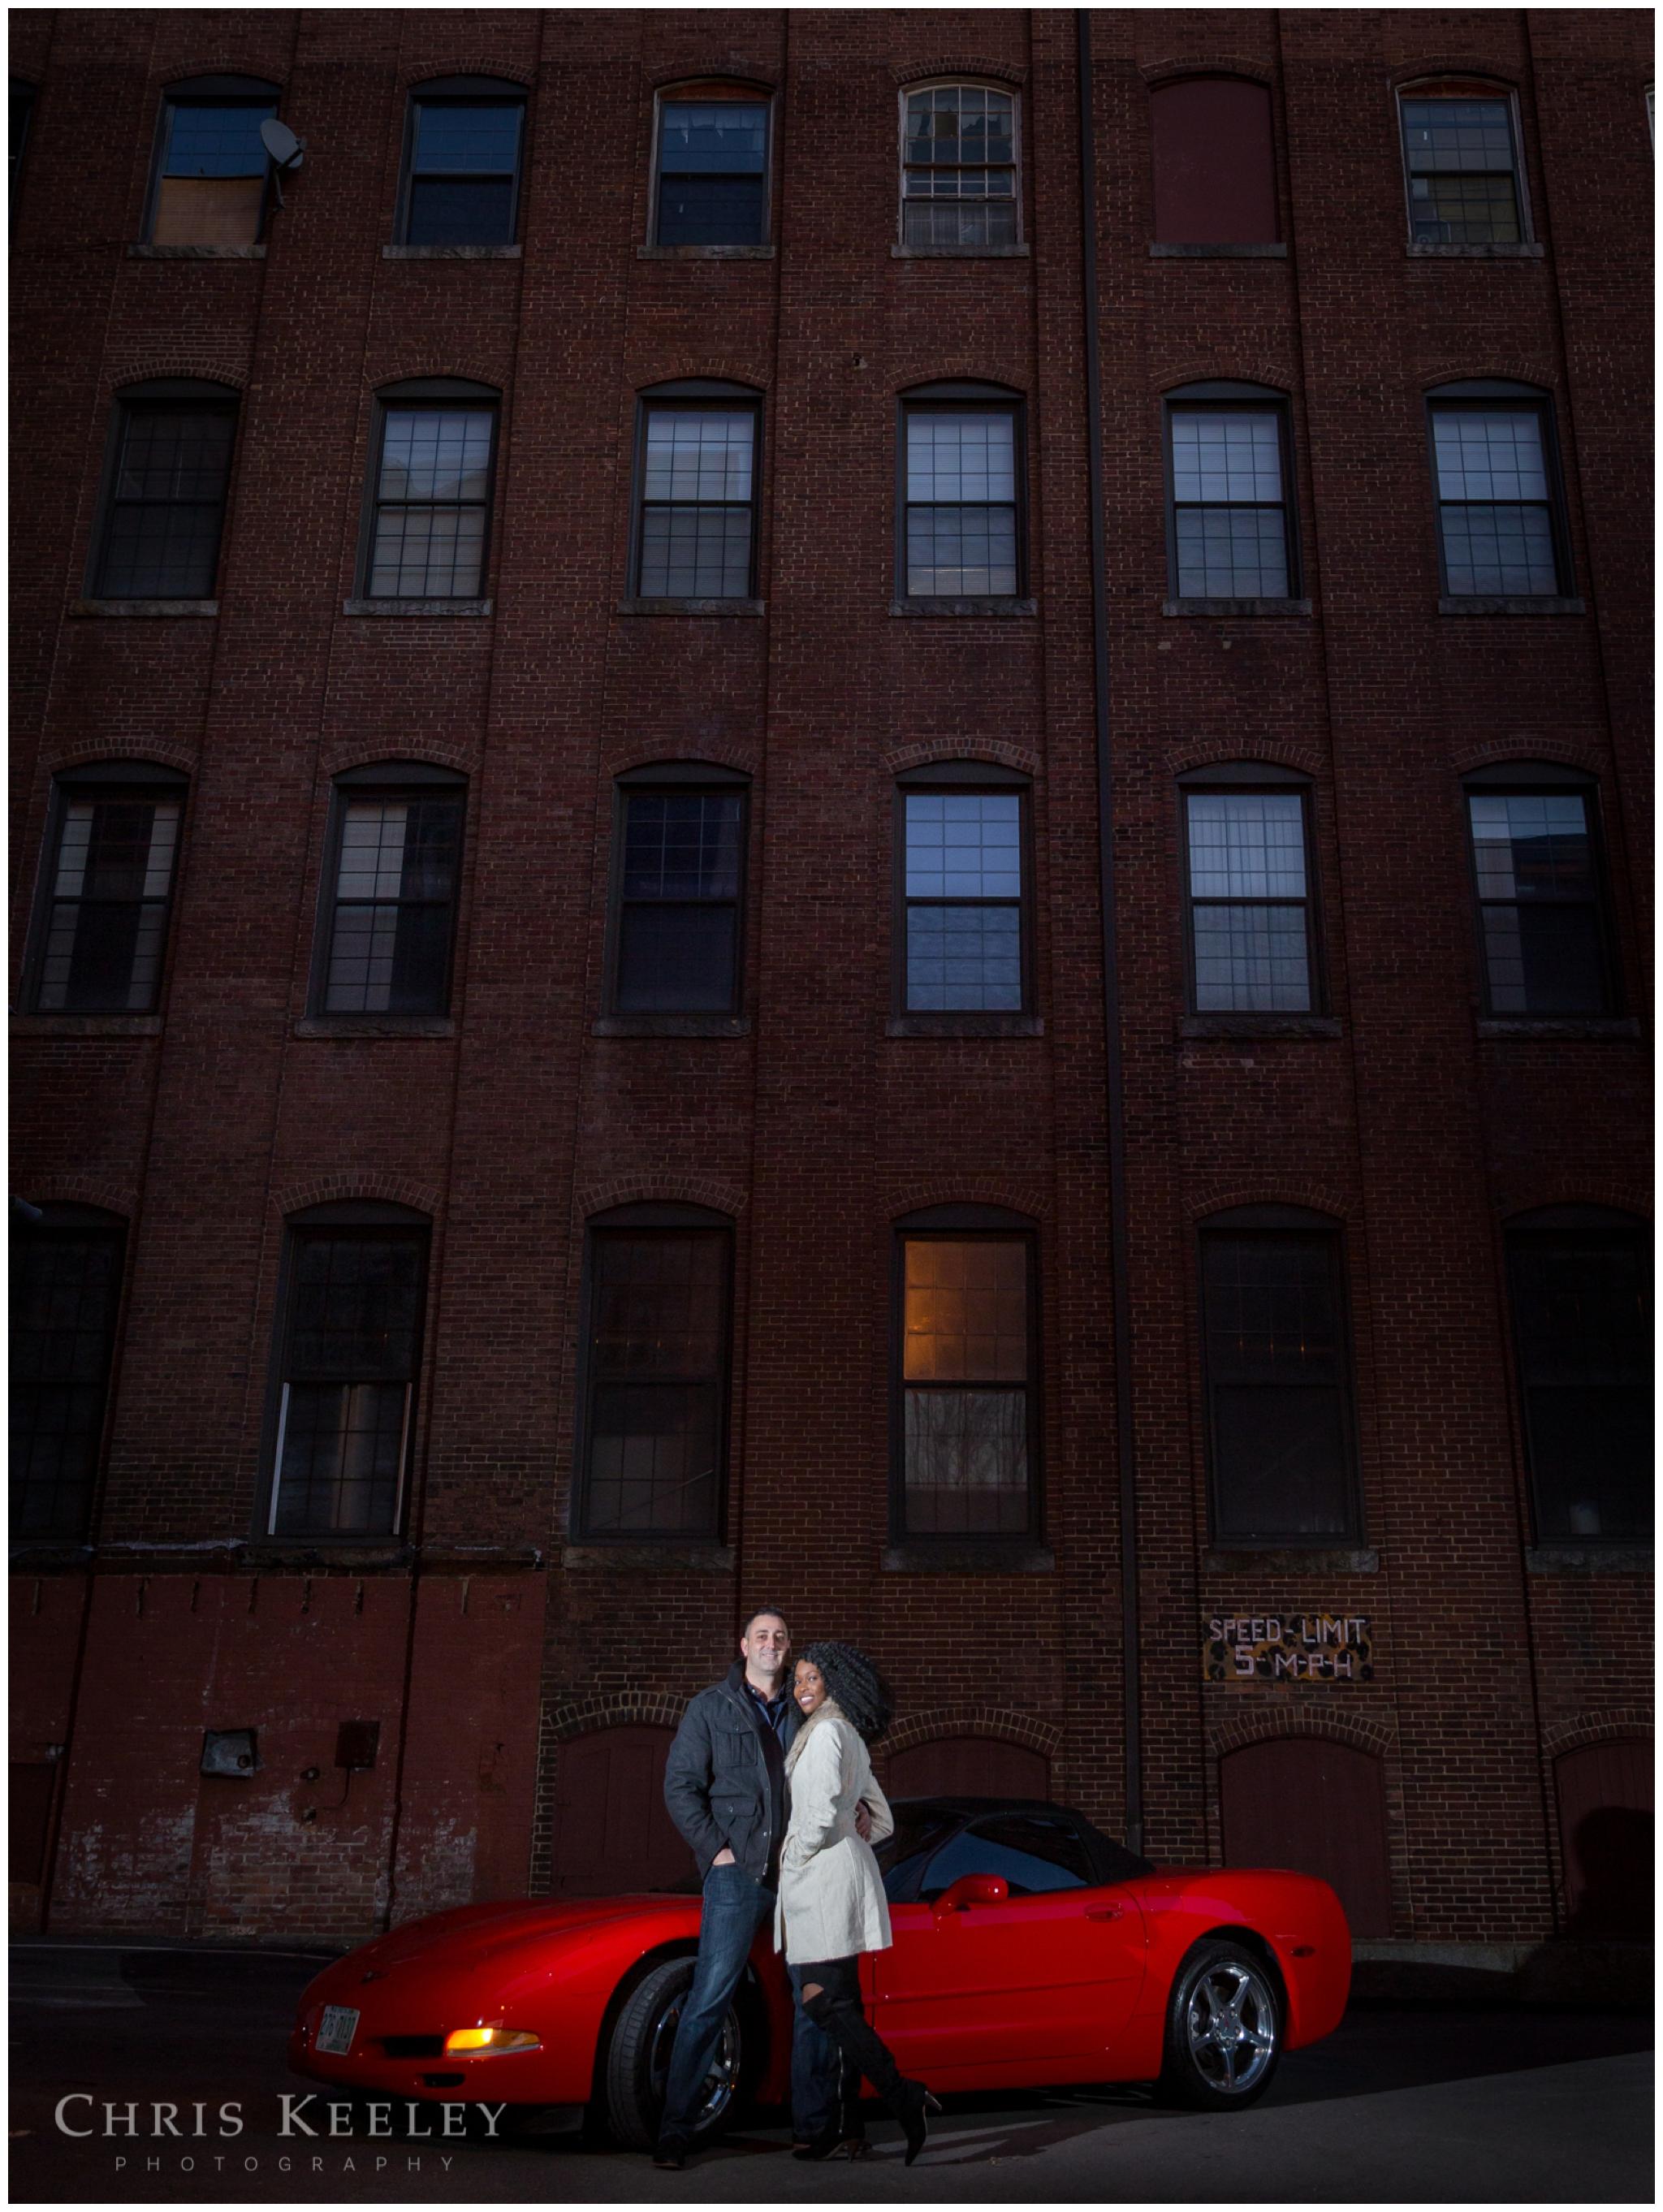 chris-keeley-photography-dover-new-hampshire-engagement-wedding-02.jpg